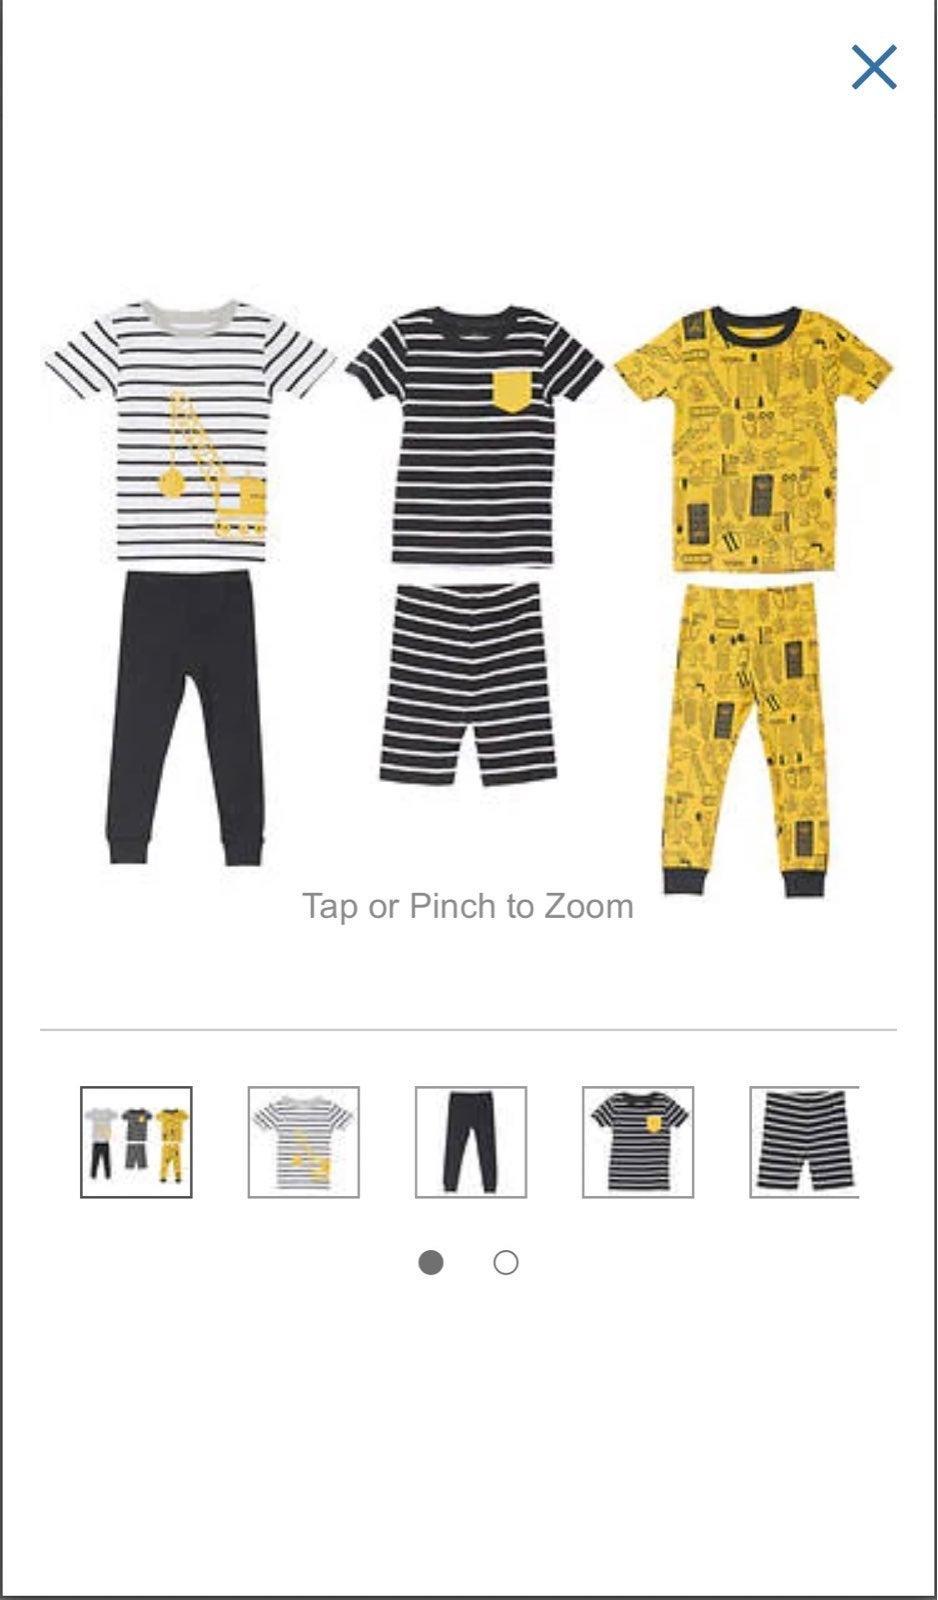 Carter's 6 piece pajama set